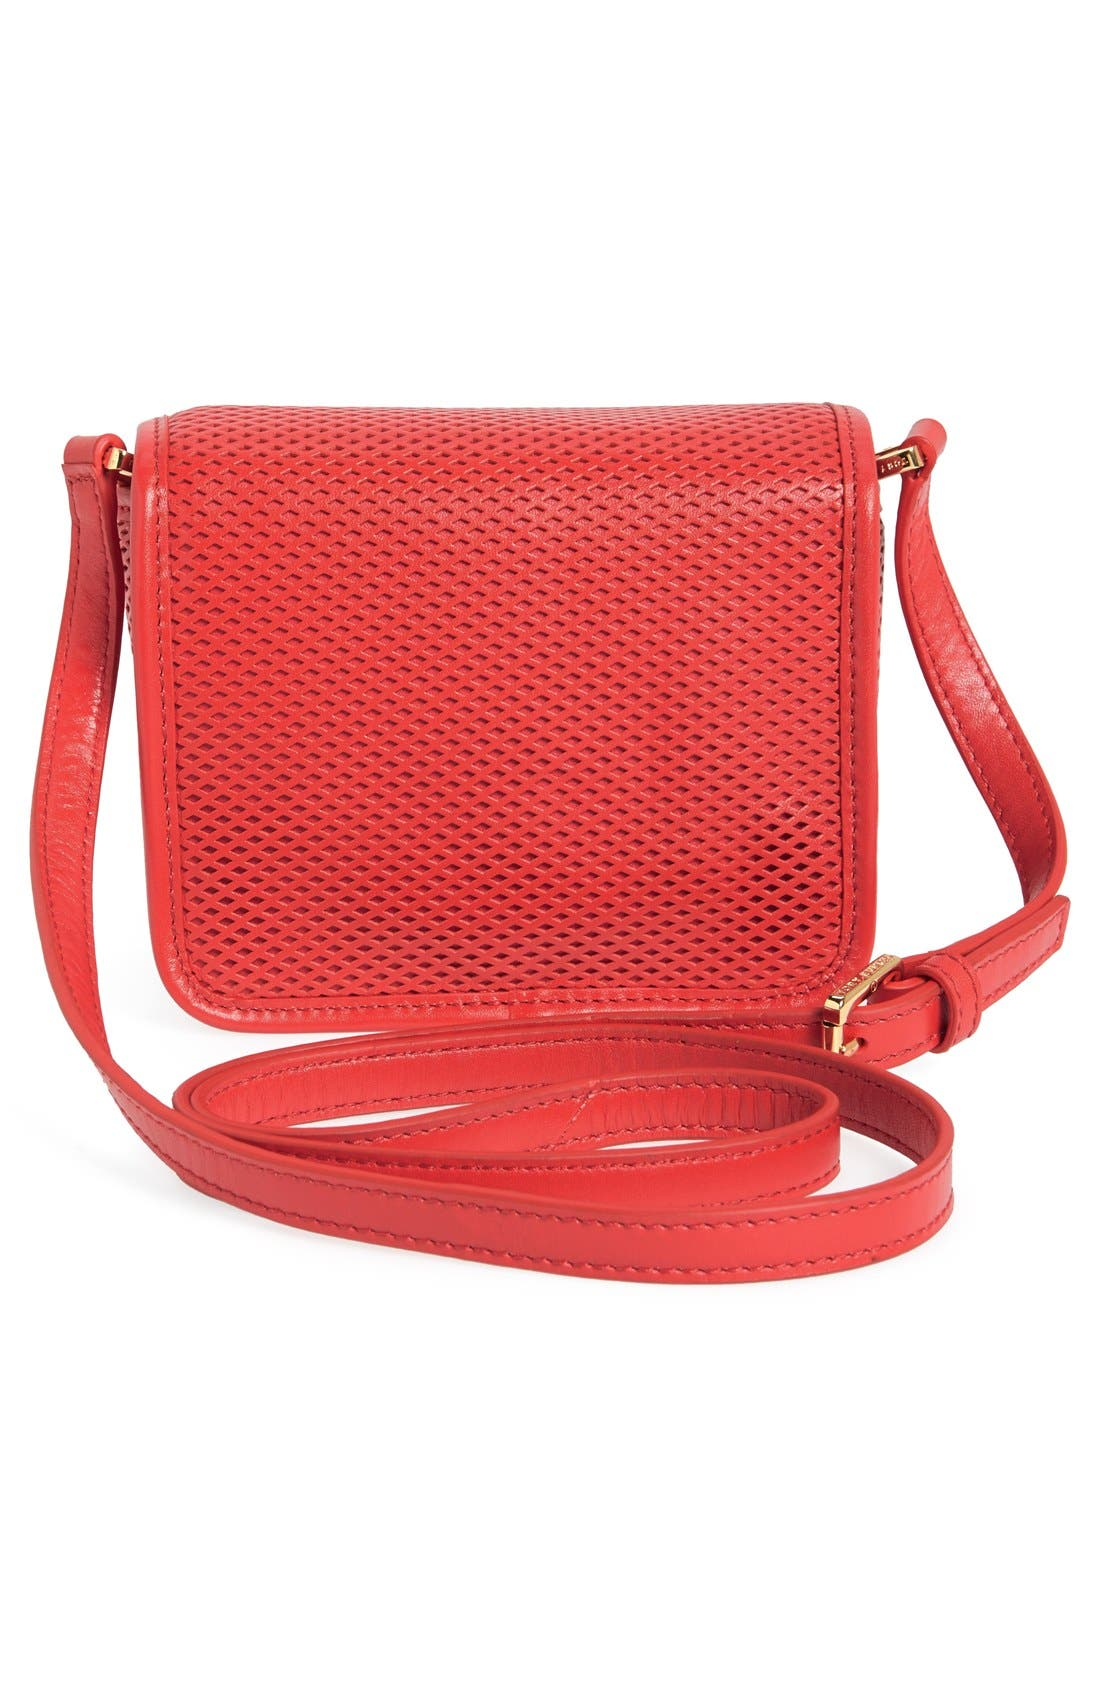 Alternate Image 4  - Tory Burch 'Mini Harper' Leather Crossbody Bag